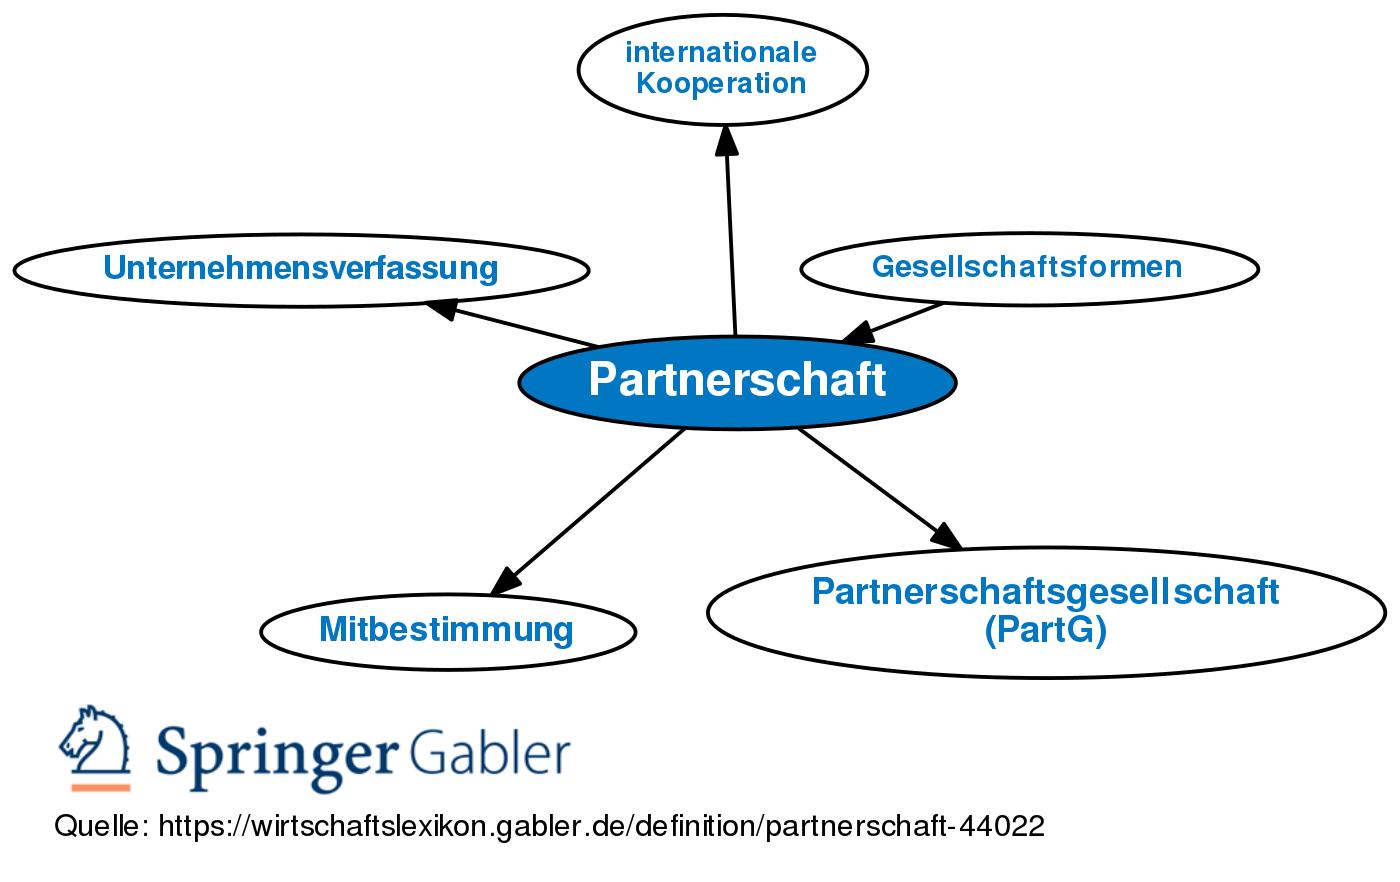 Partnerschaft • Definition | Gabler Wirtschaftslexikon